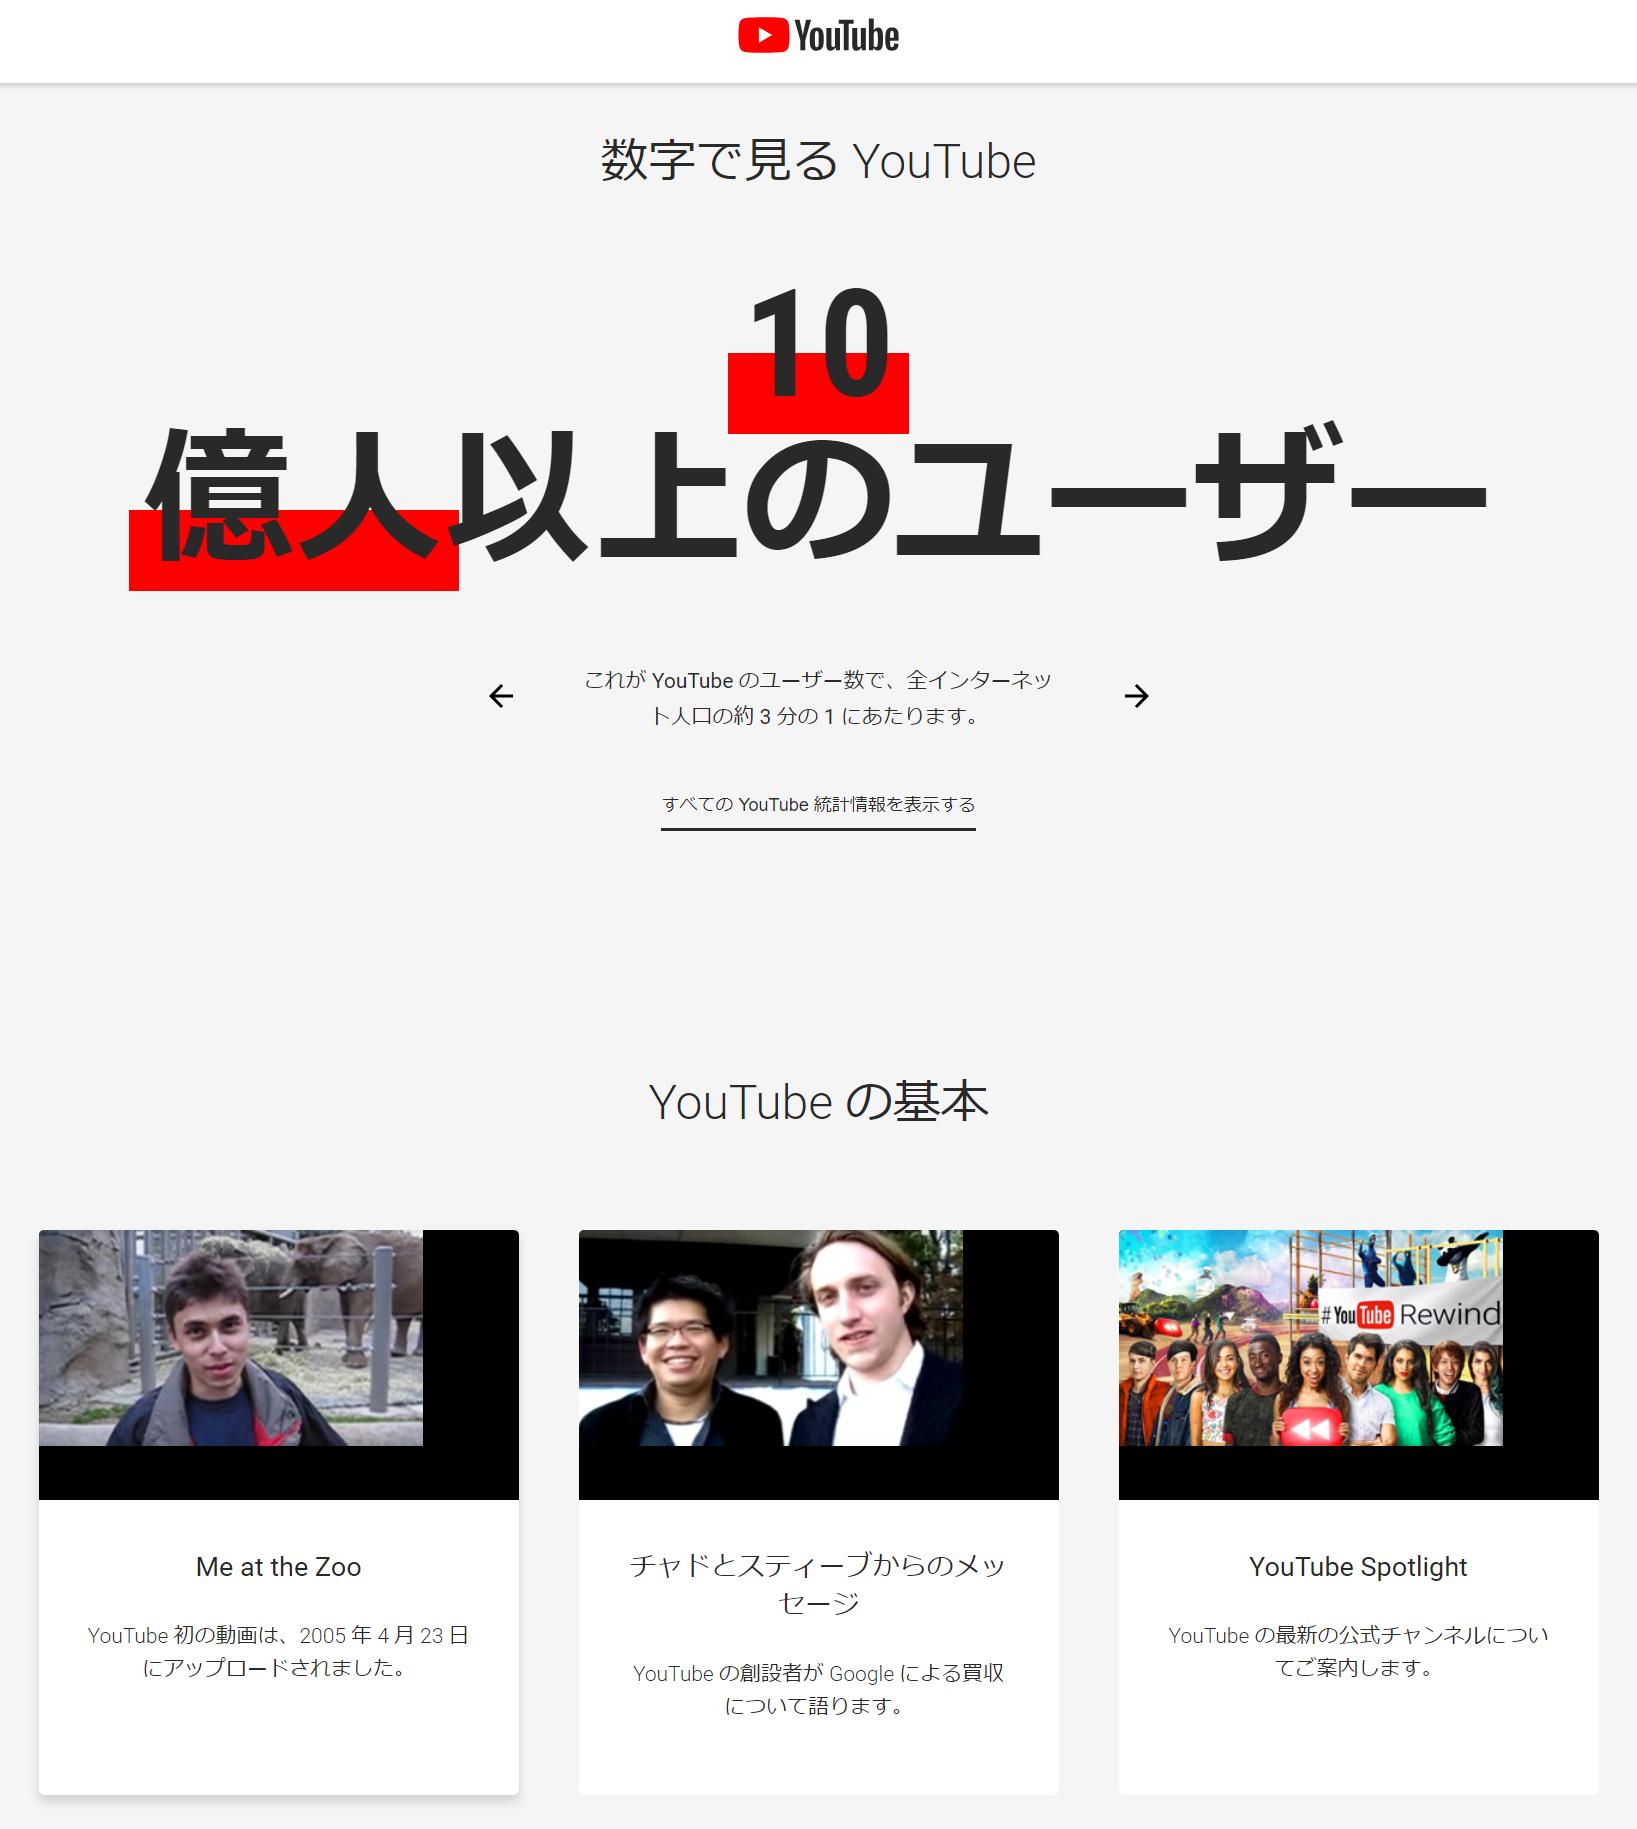 YouTube-プレスルーム